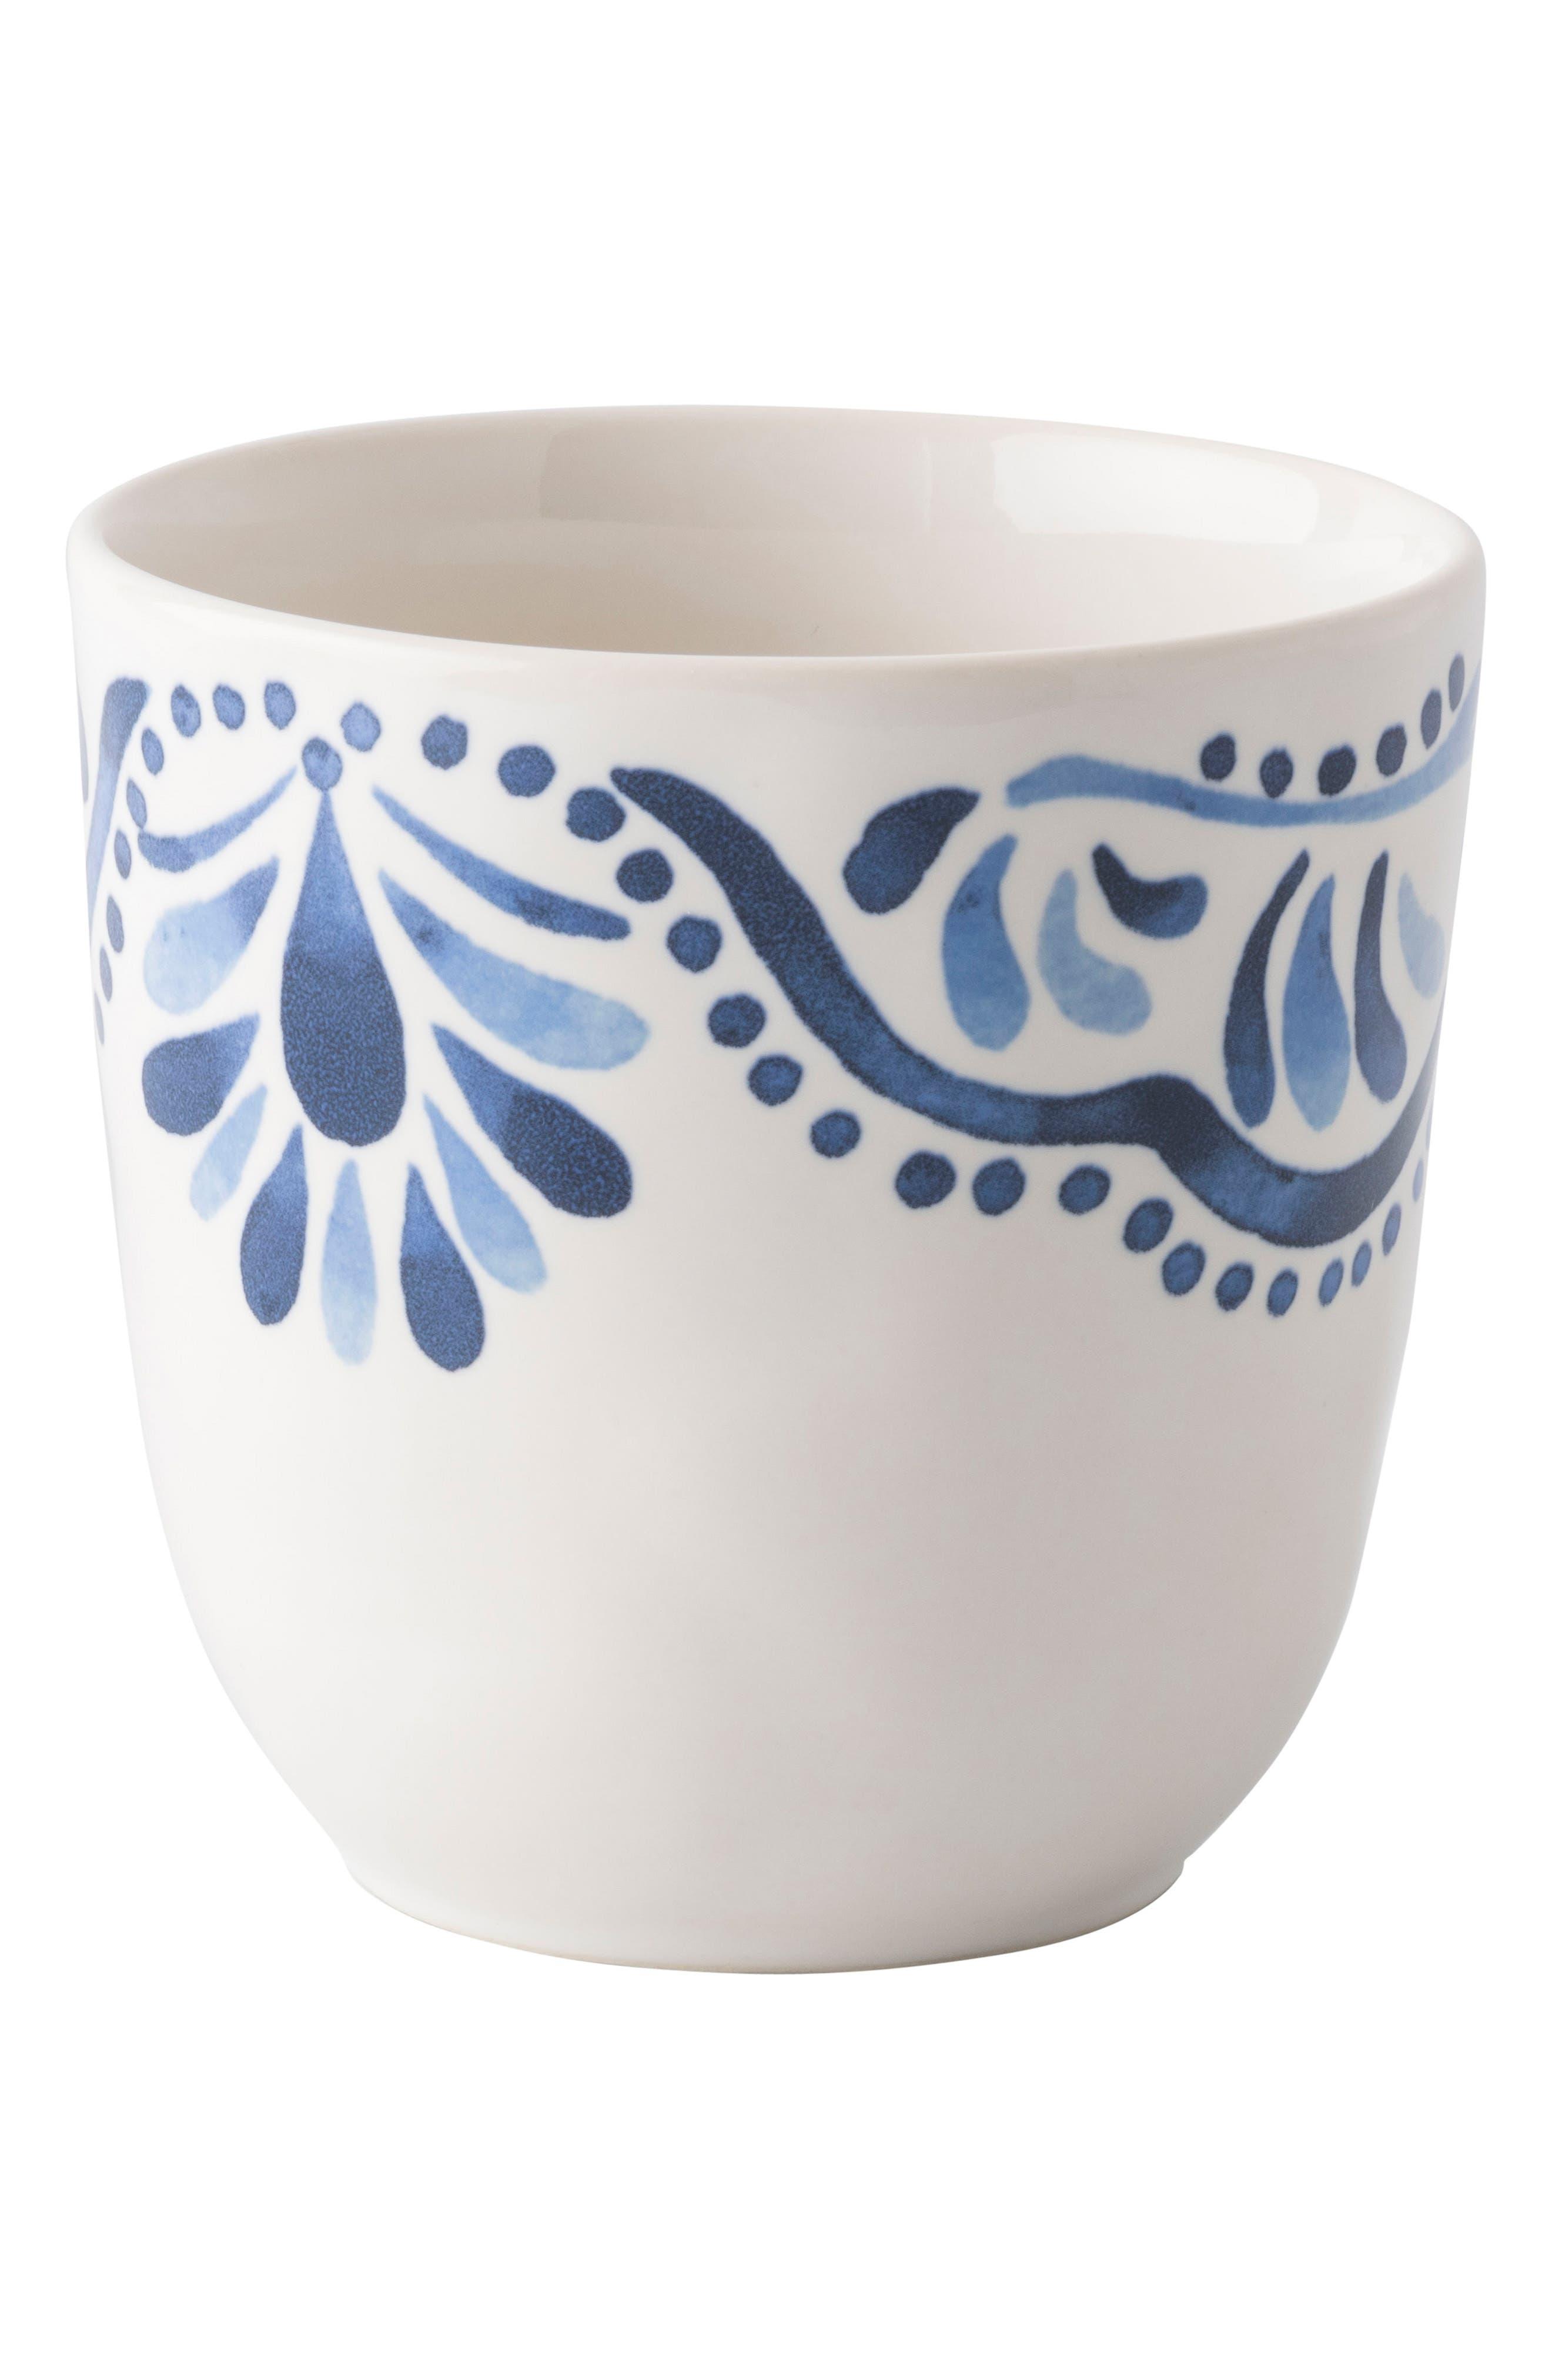 Juliska Wanderlust Collection - Iberian Journey Ceramic Coffee/Tea Cup